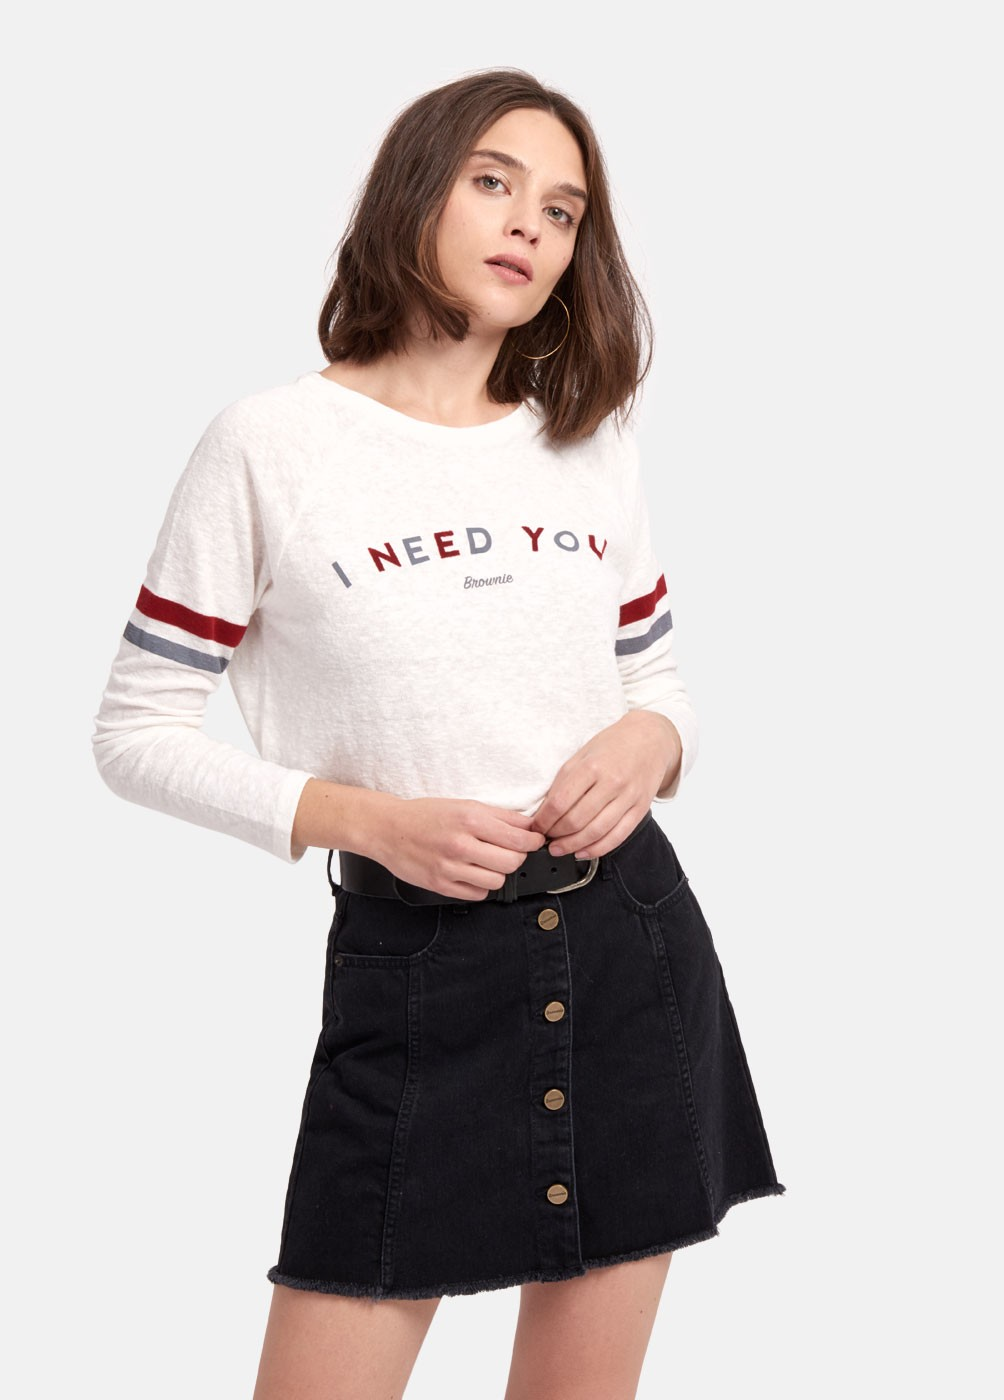 Need you t-shirt